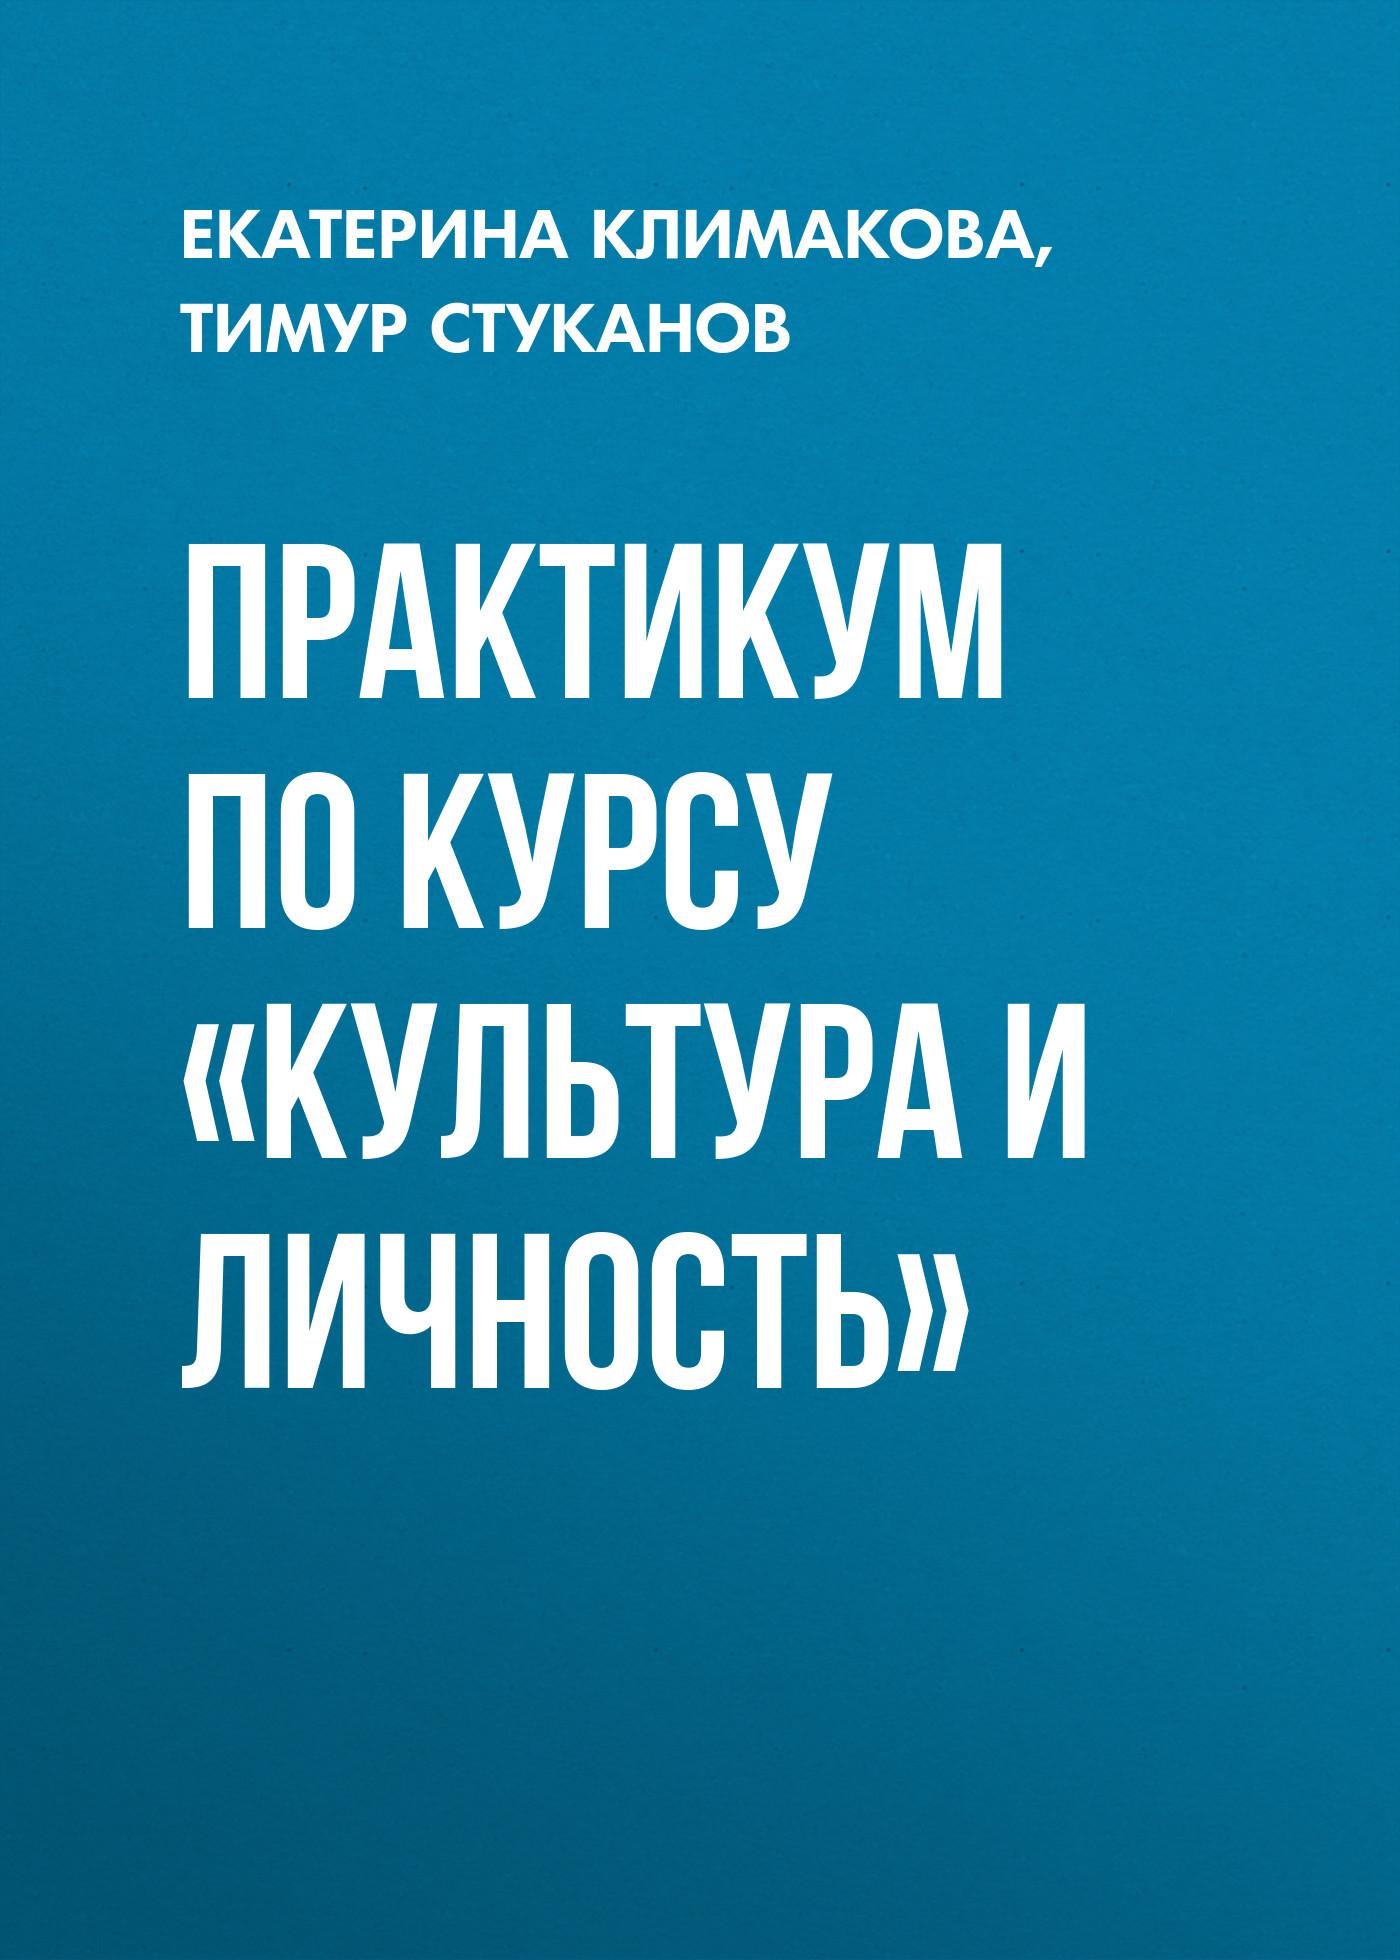 Екатерина Климакова Практикум по курсу «Культура и личность»